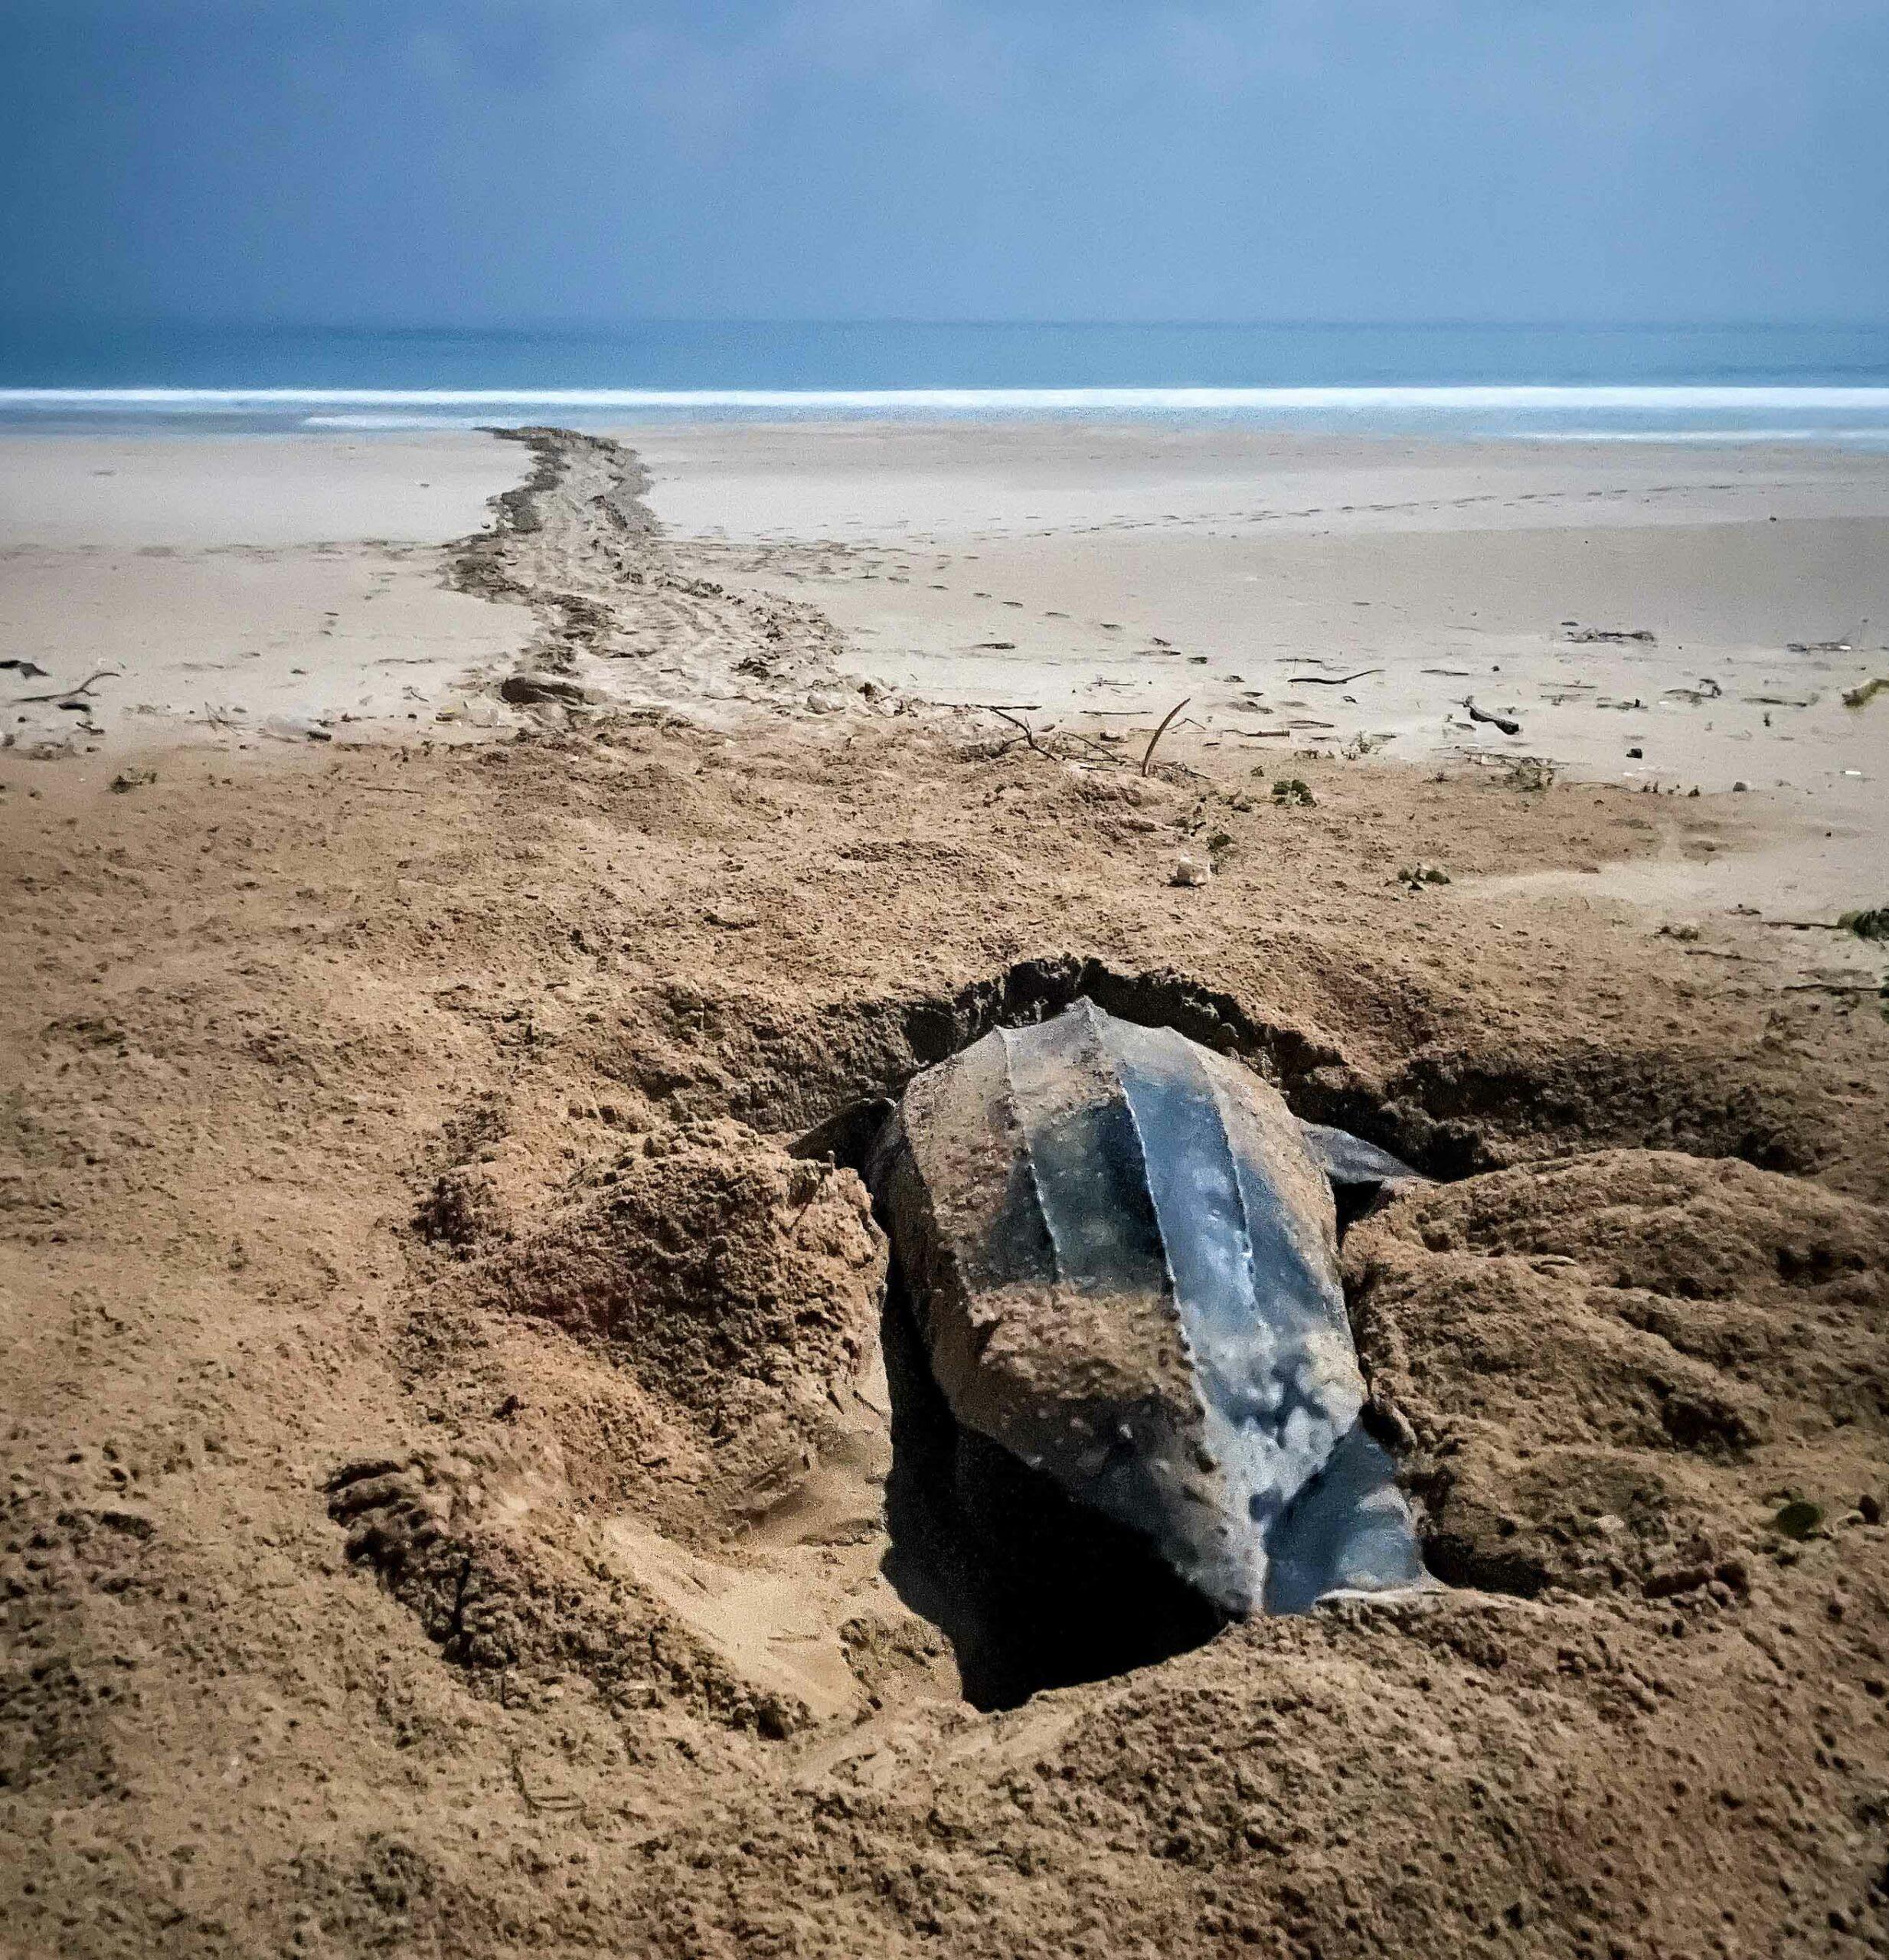 Leatherback turtle digging sand